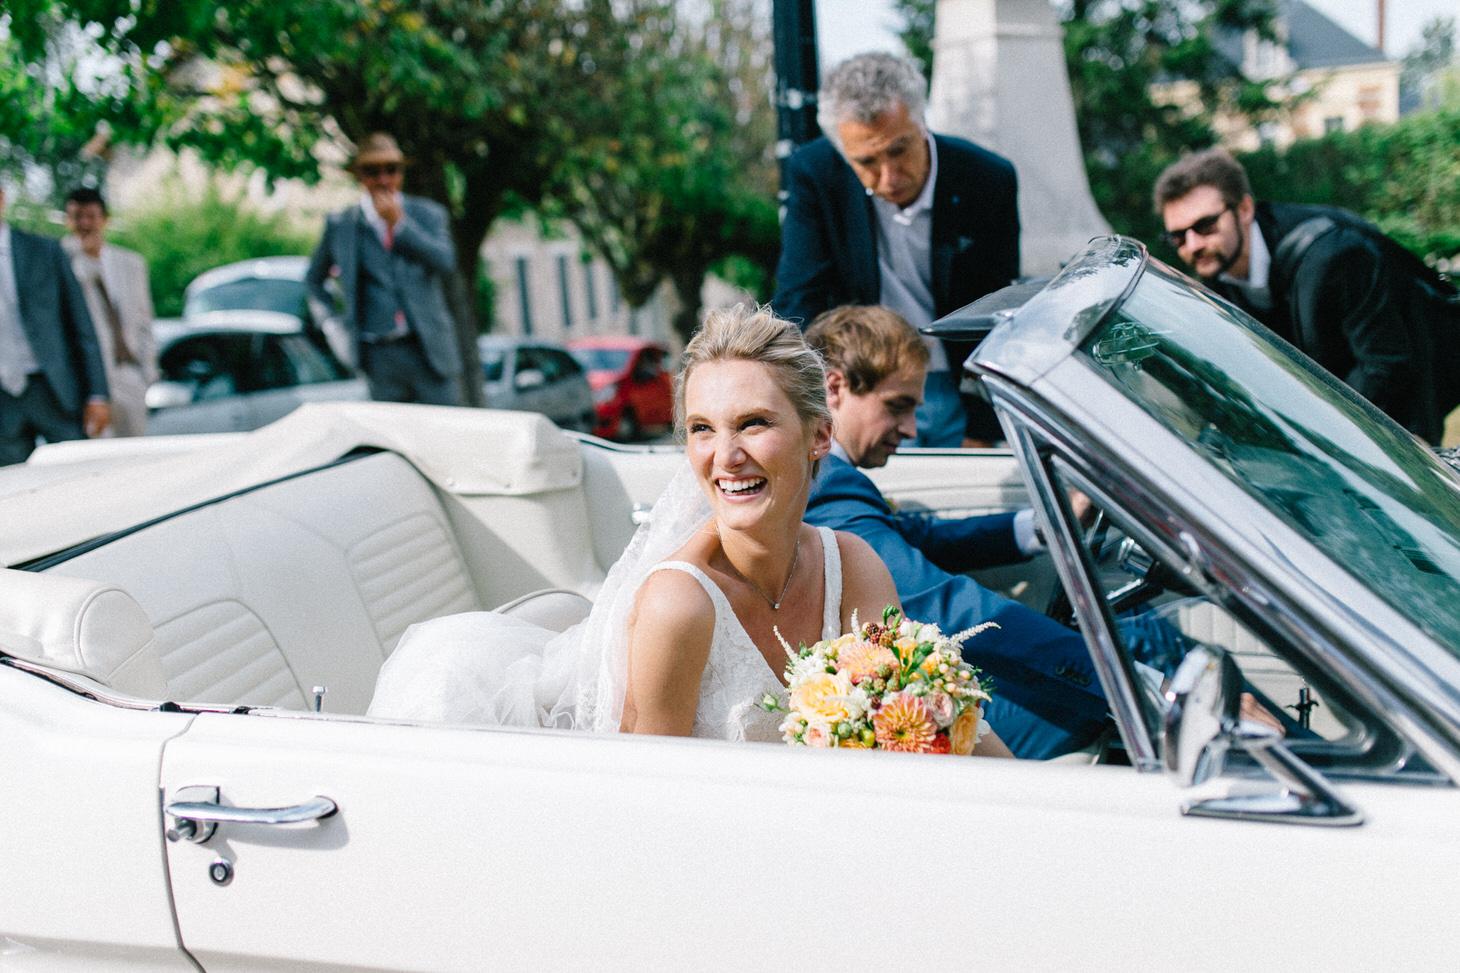 photographe-mariage-paris-montfort-l-amaury-044